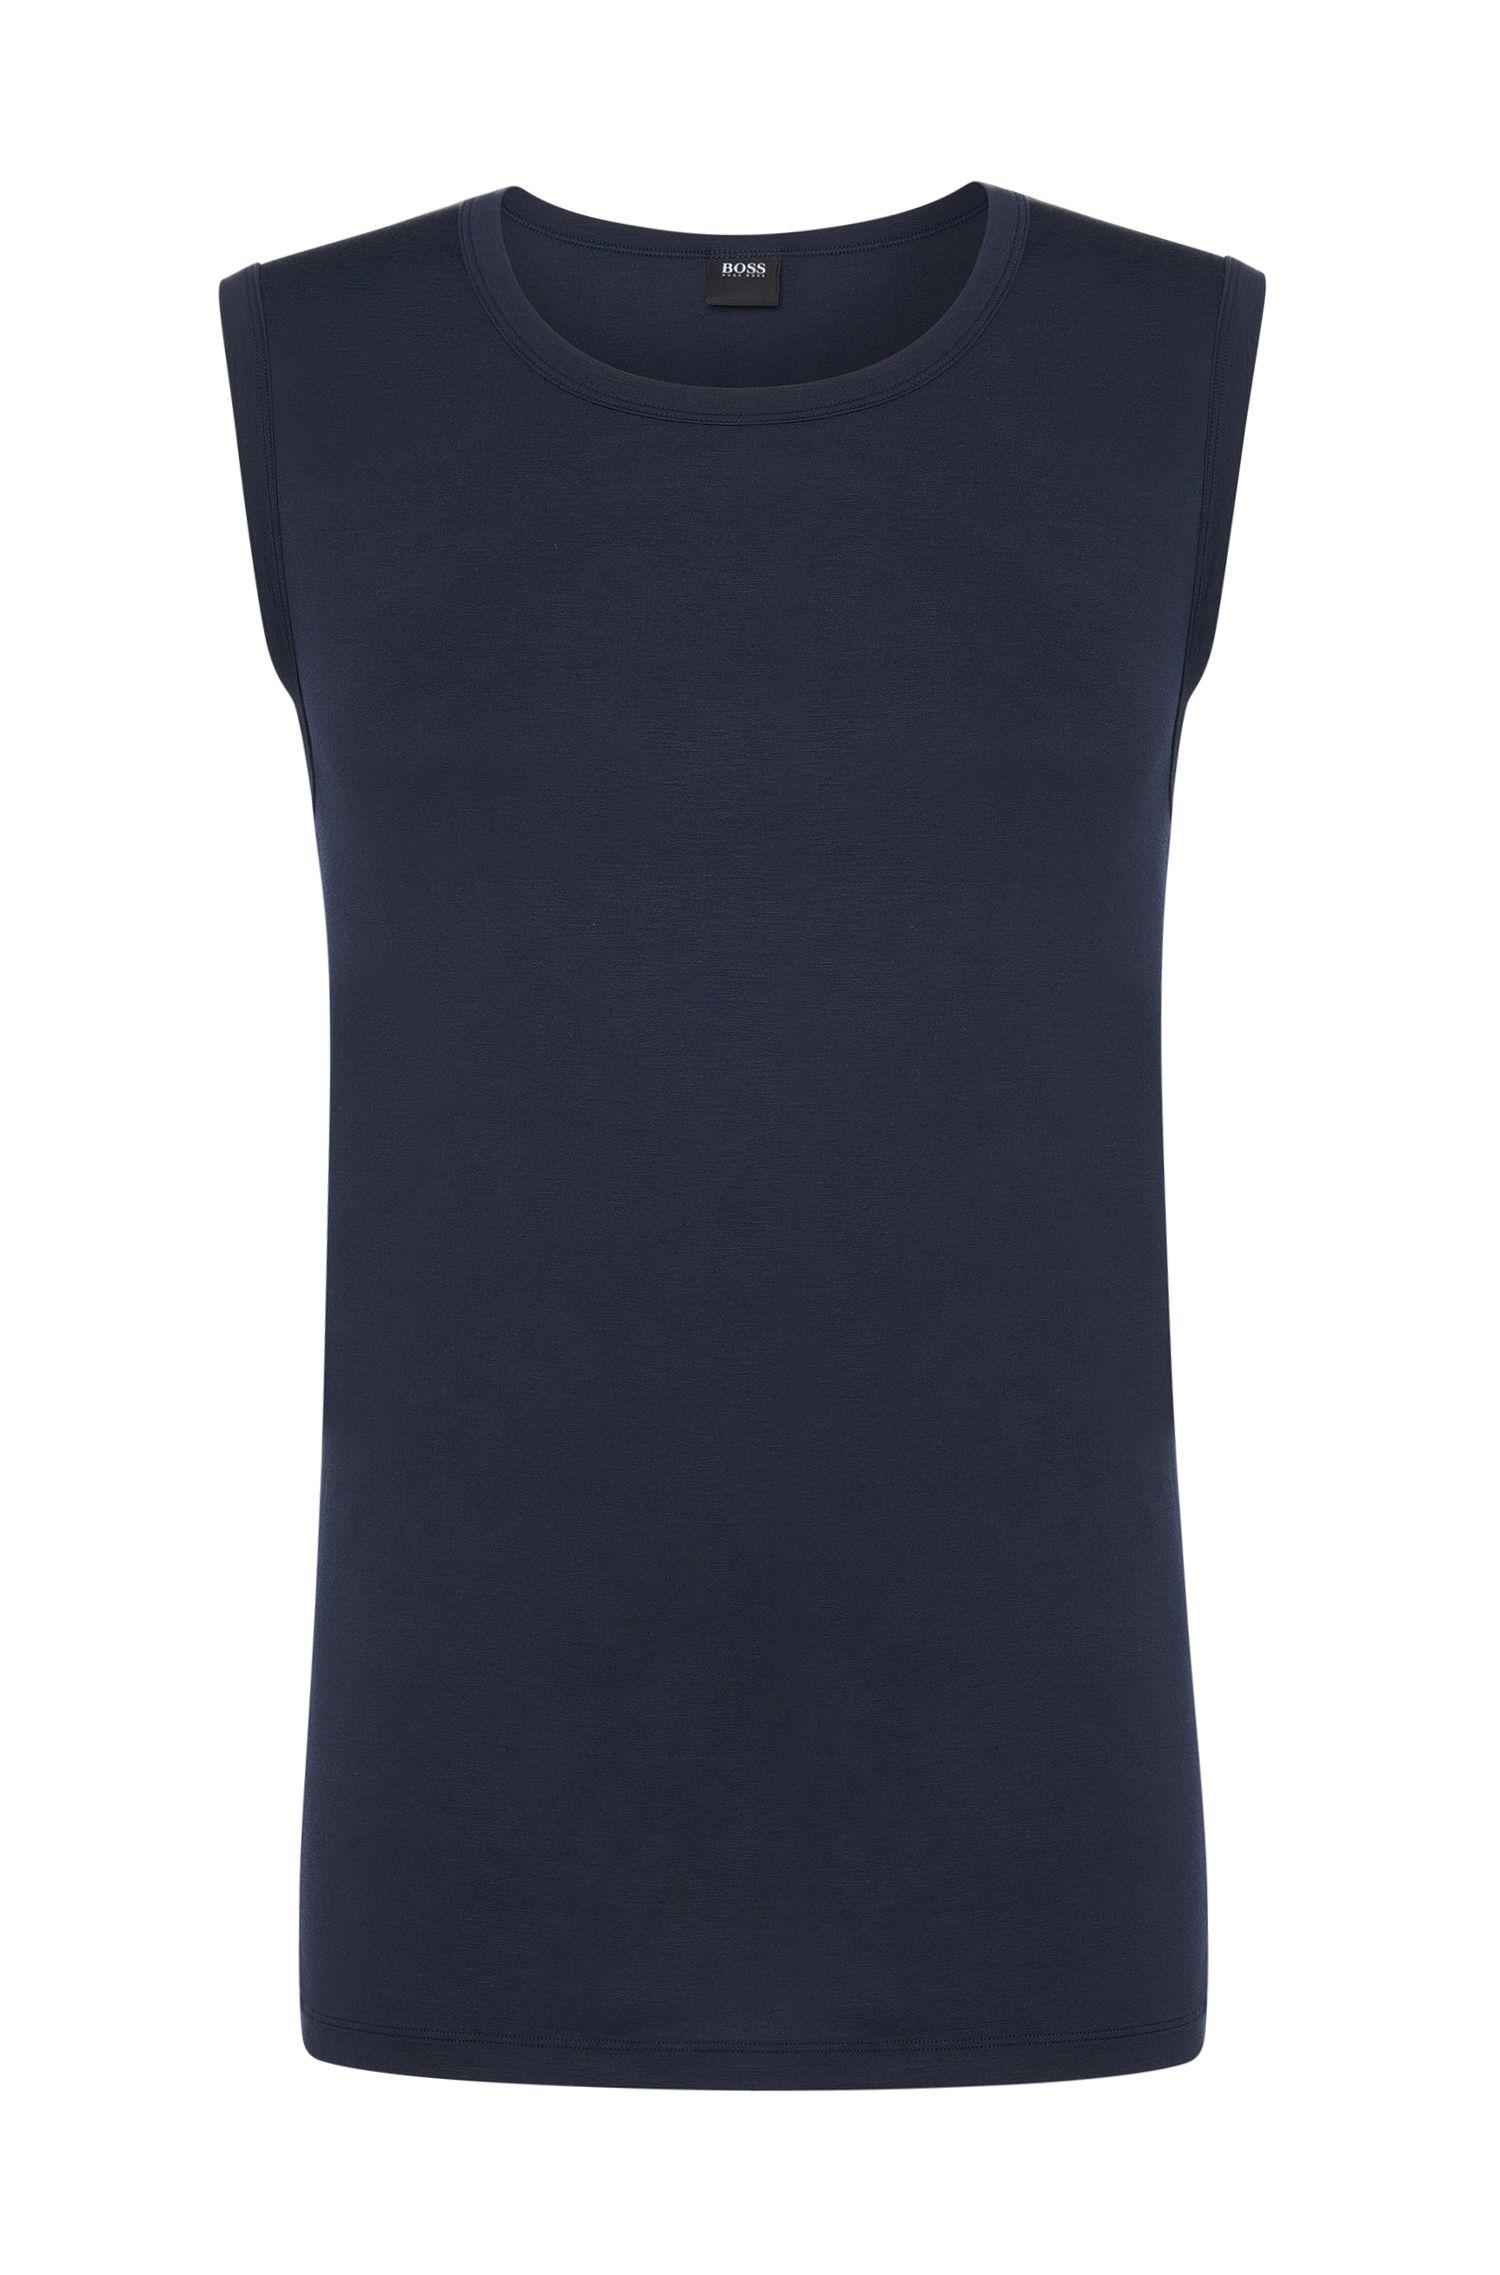 Stretch Modal Sleeveless T-Shirt | Shirt SL RN Seacell, Dark Blue